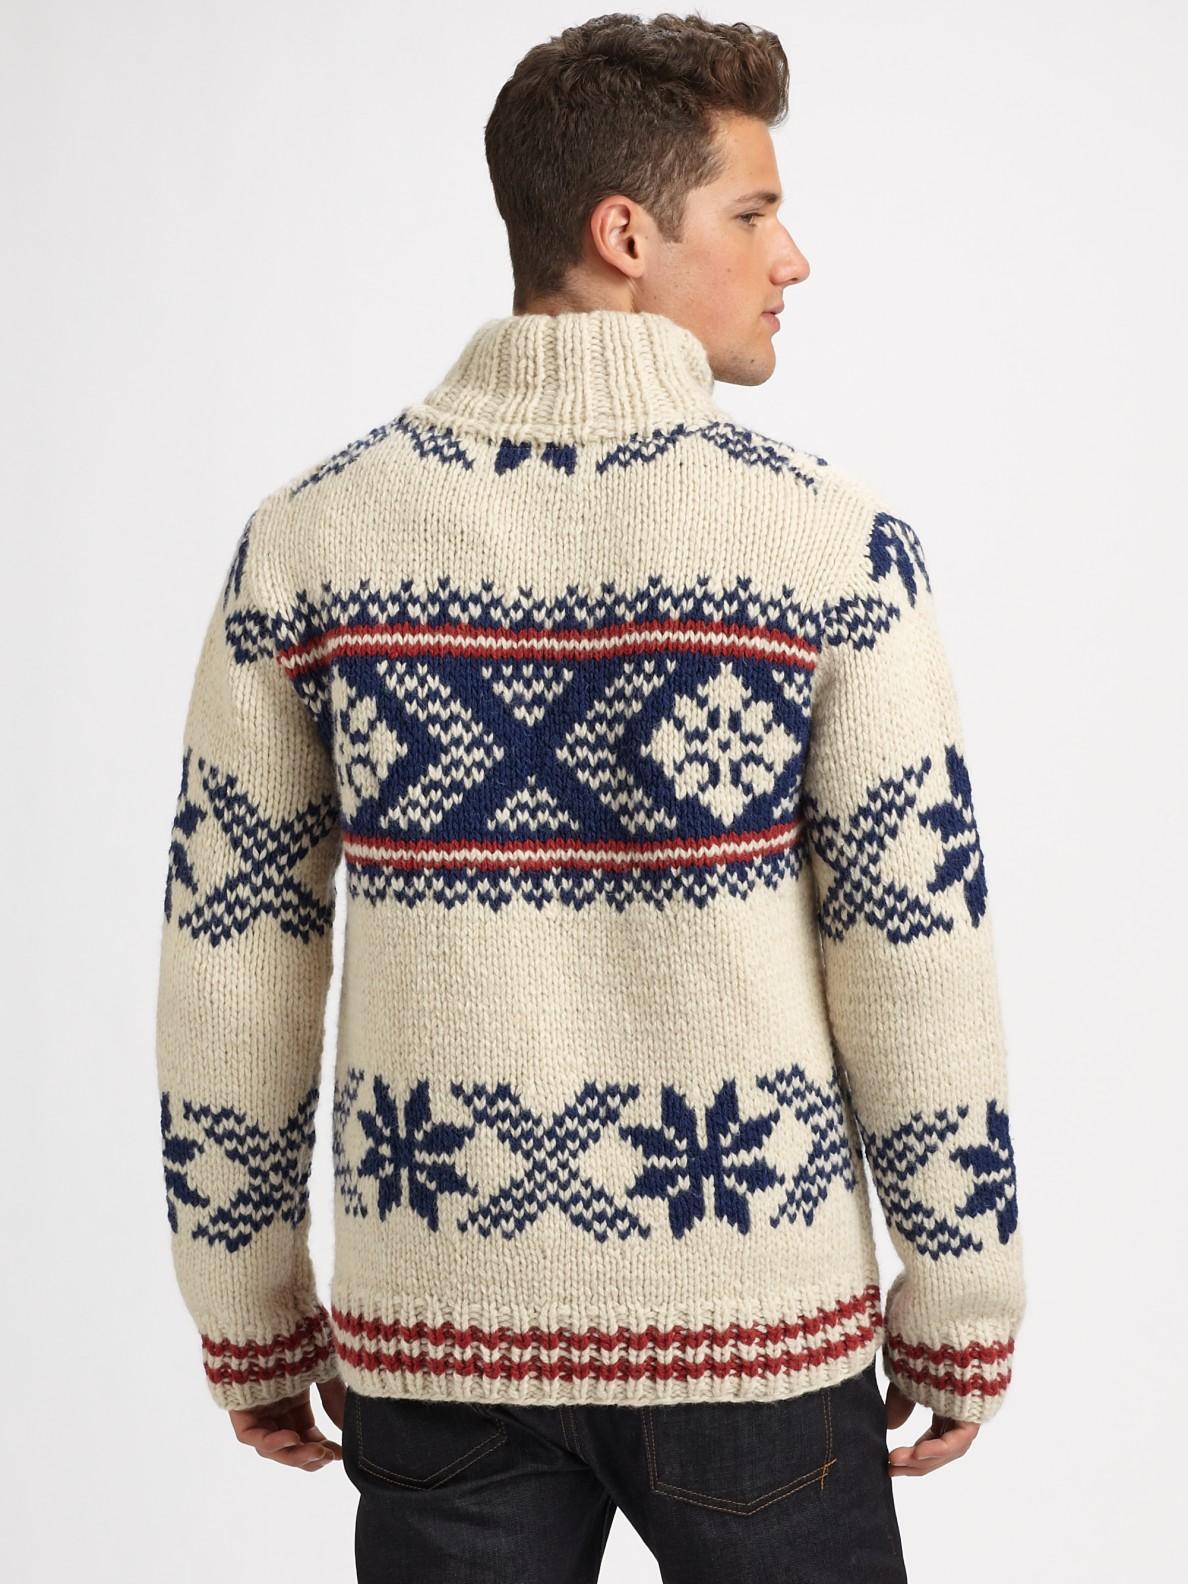 Scotch & soda Hand-knit Wool Sweater in White for Men | Lyst